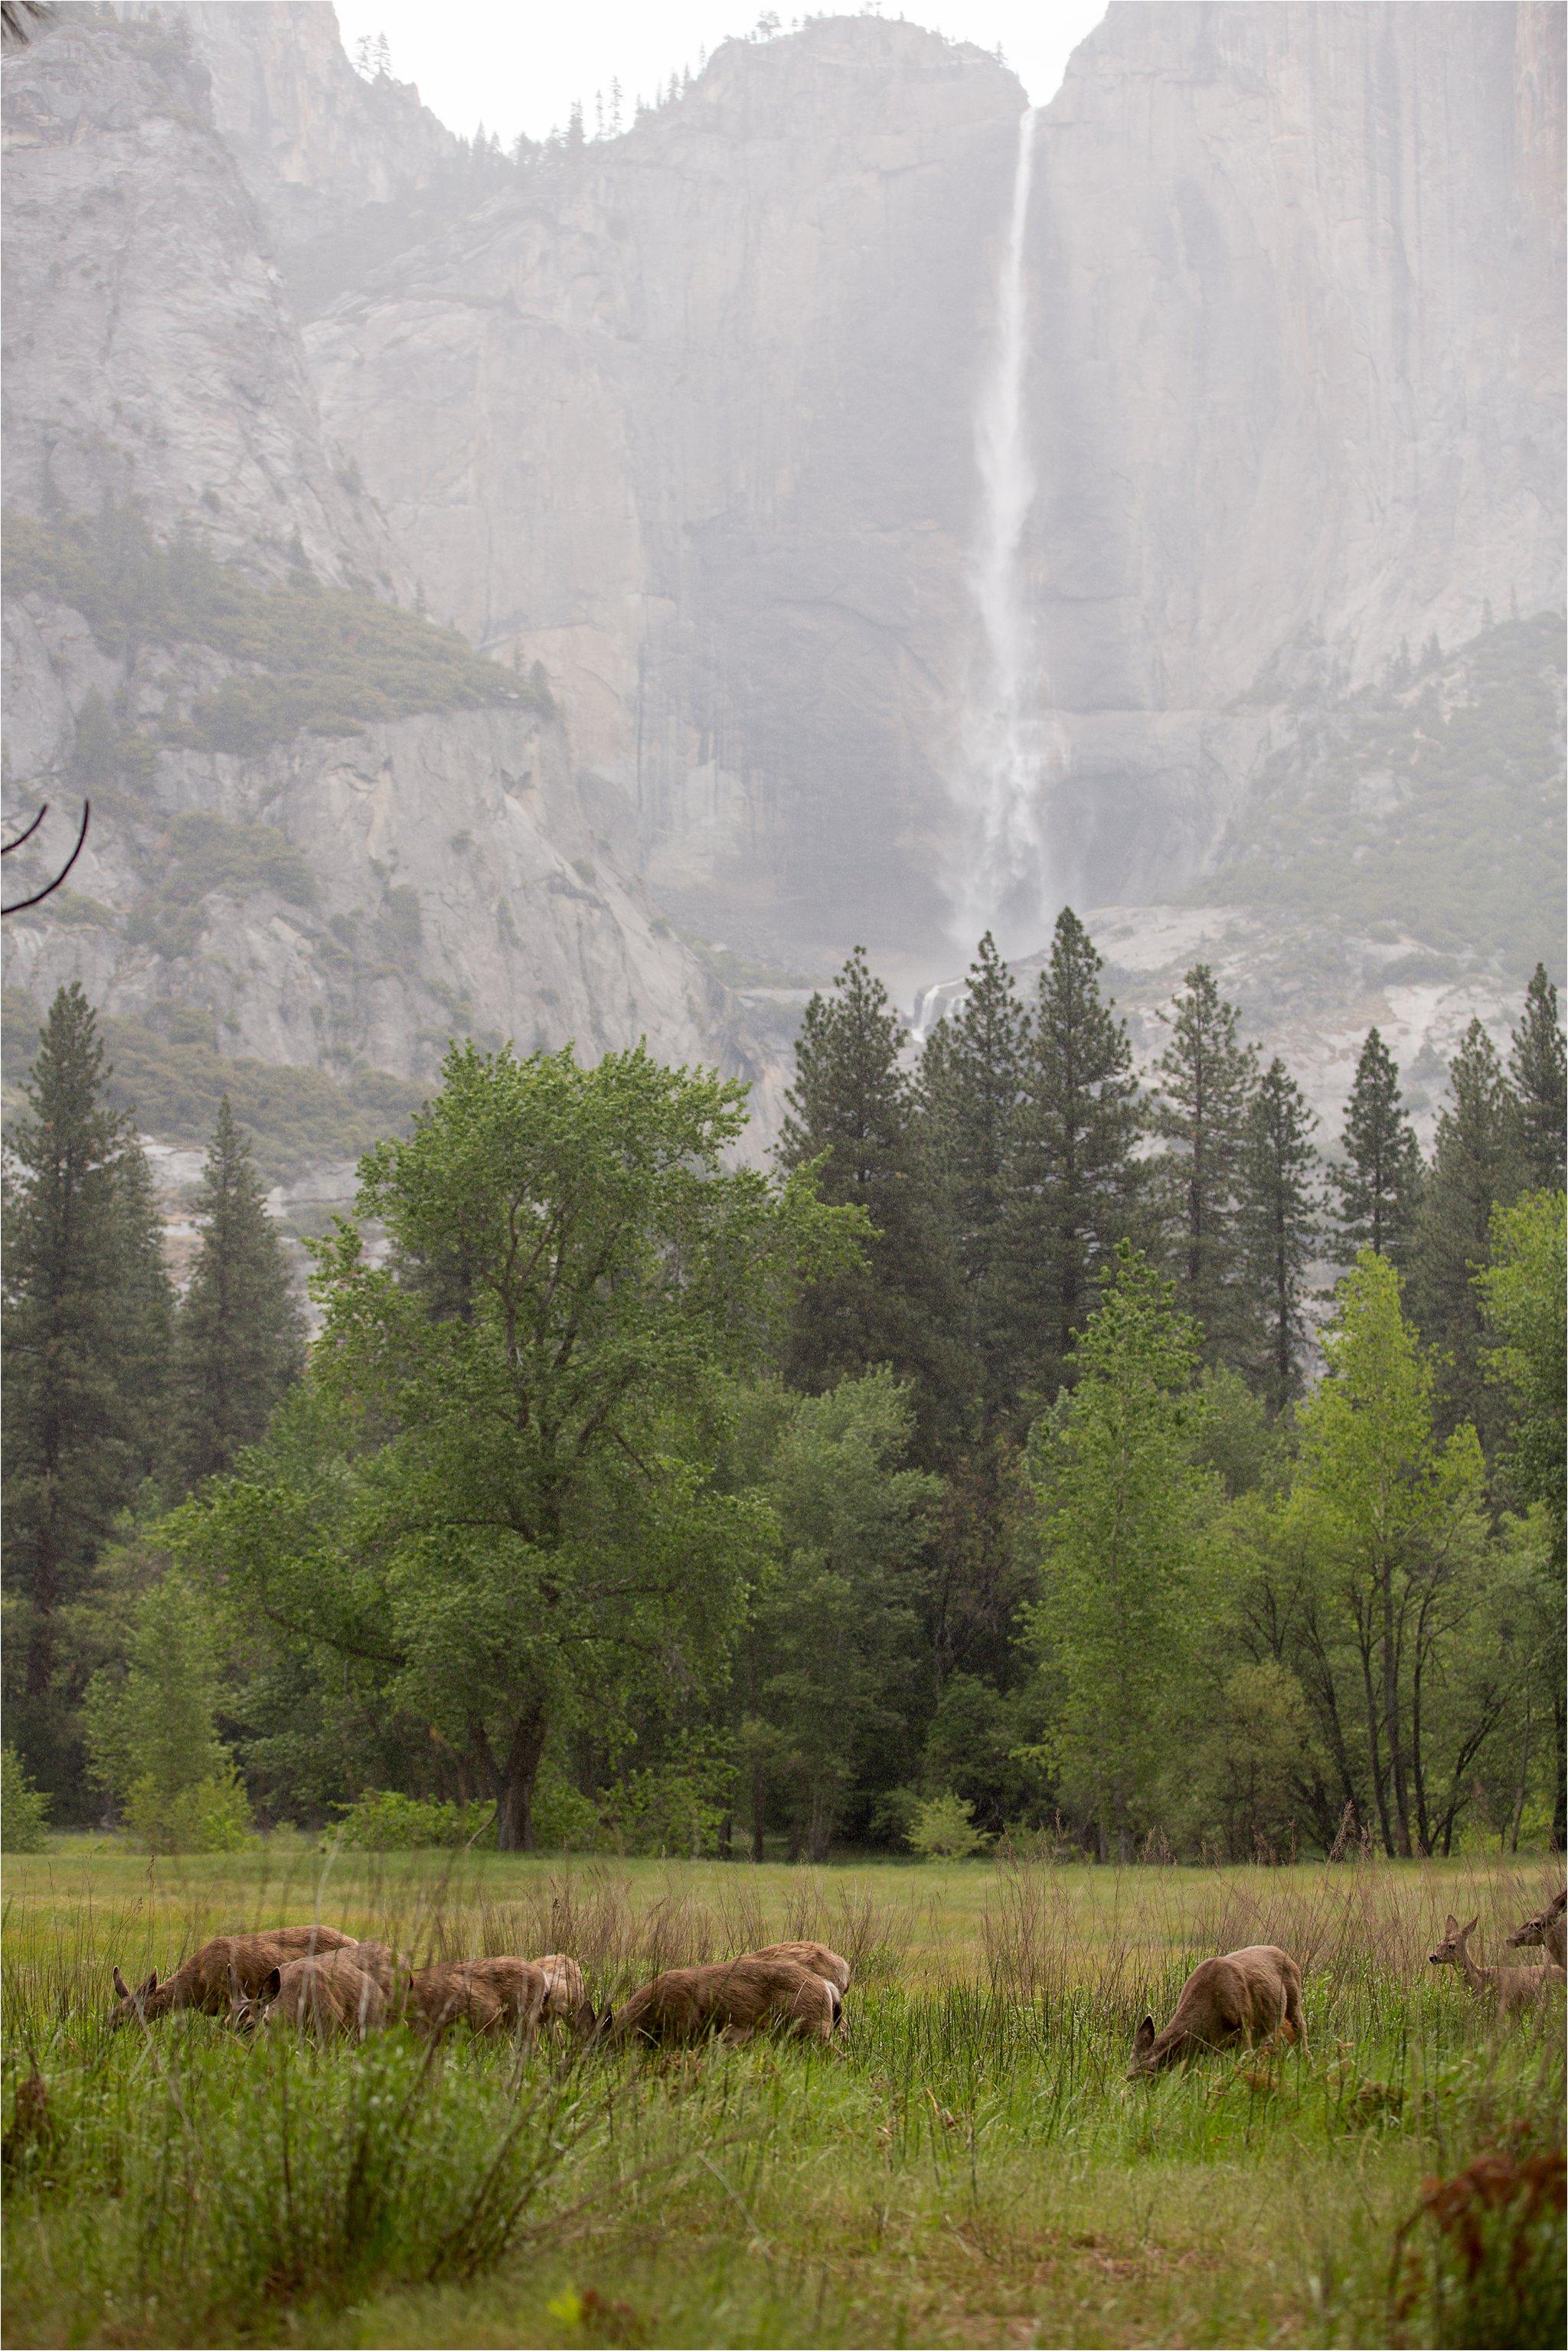 Waterfall and Deer in Yosemite National Park